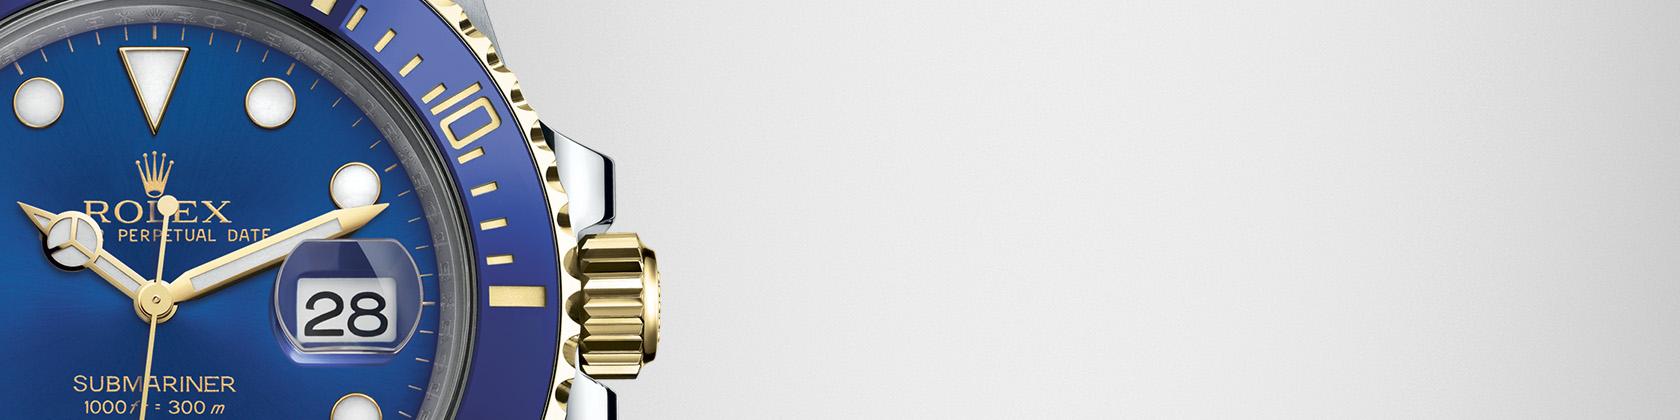 Rolex m116613lb-005